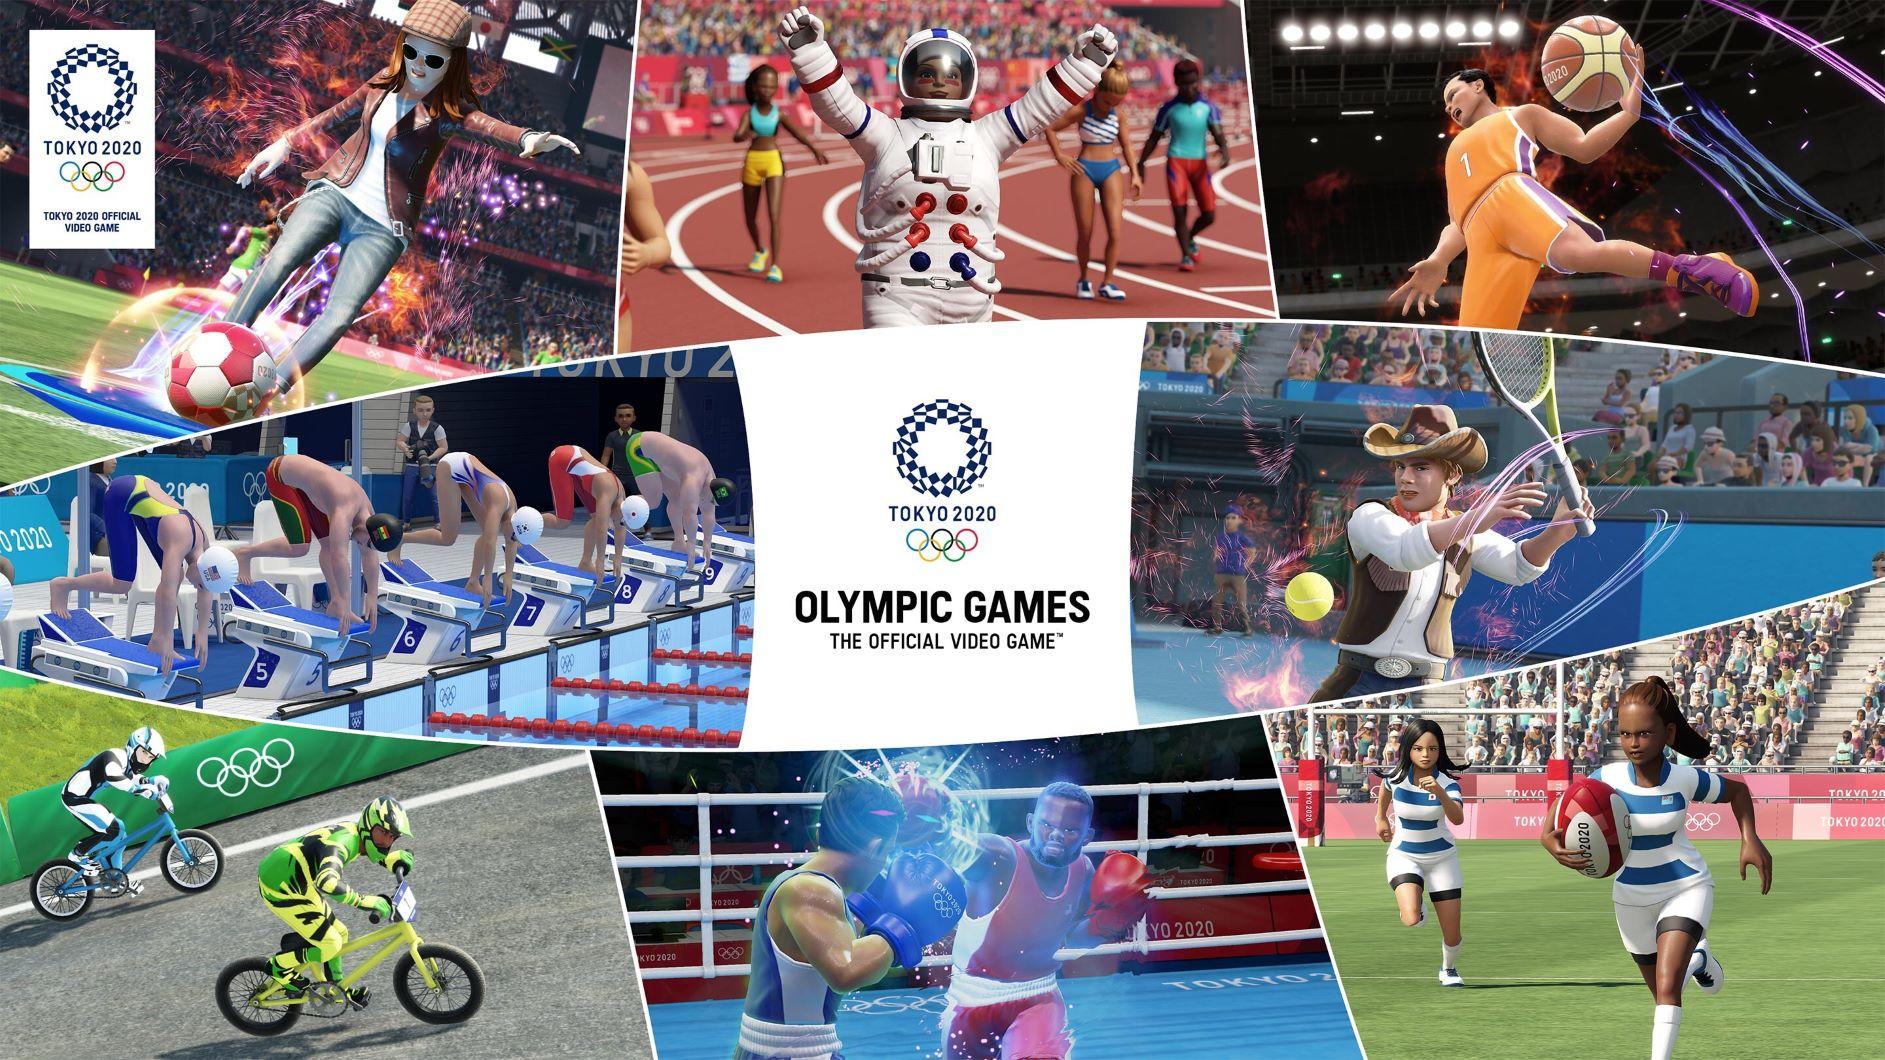 Test Jeux Olympiques De Tokyo 2020 Quand Olympiades Rime Avec Arcade Geeko